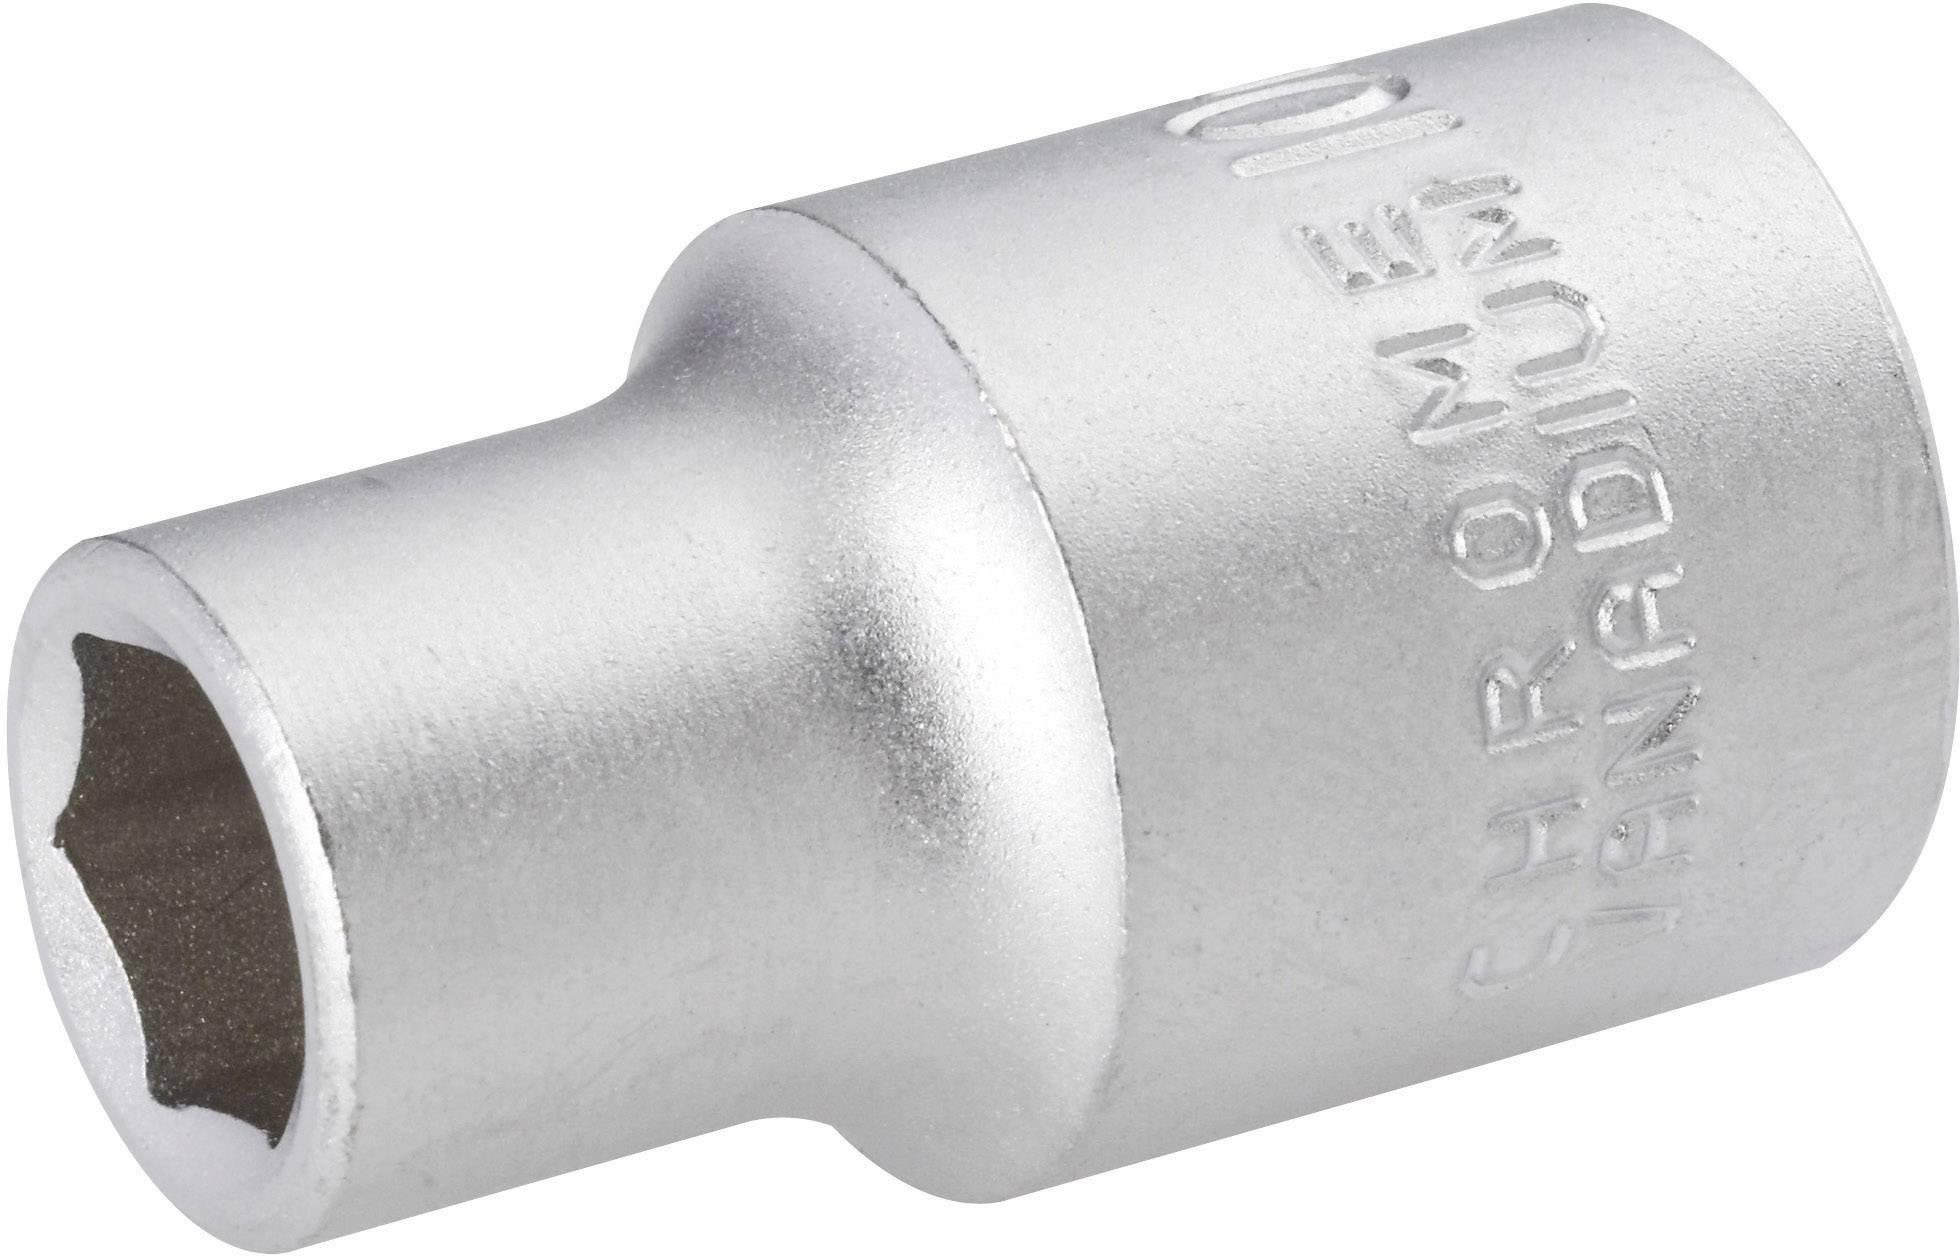 "Nadstavec na račňu TOOLCRAFT 820765, 1/2"" (12.5 mm), 12 mm"